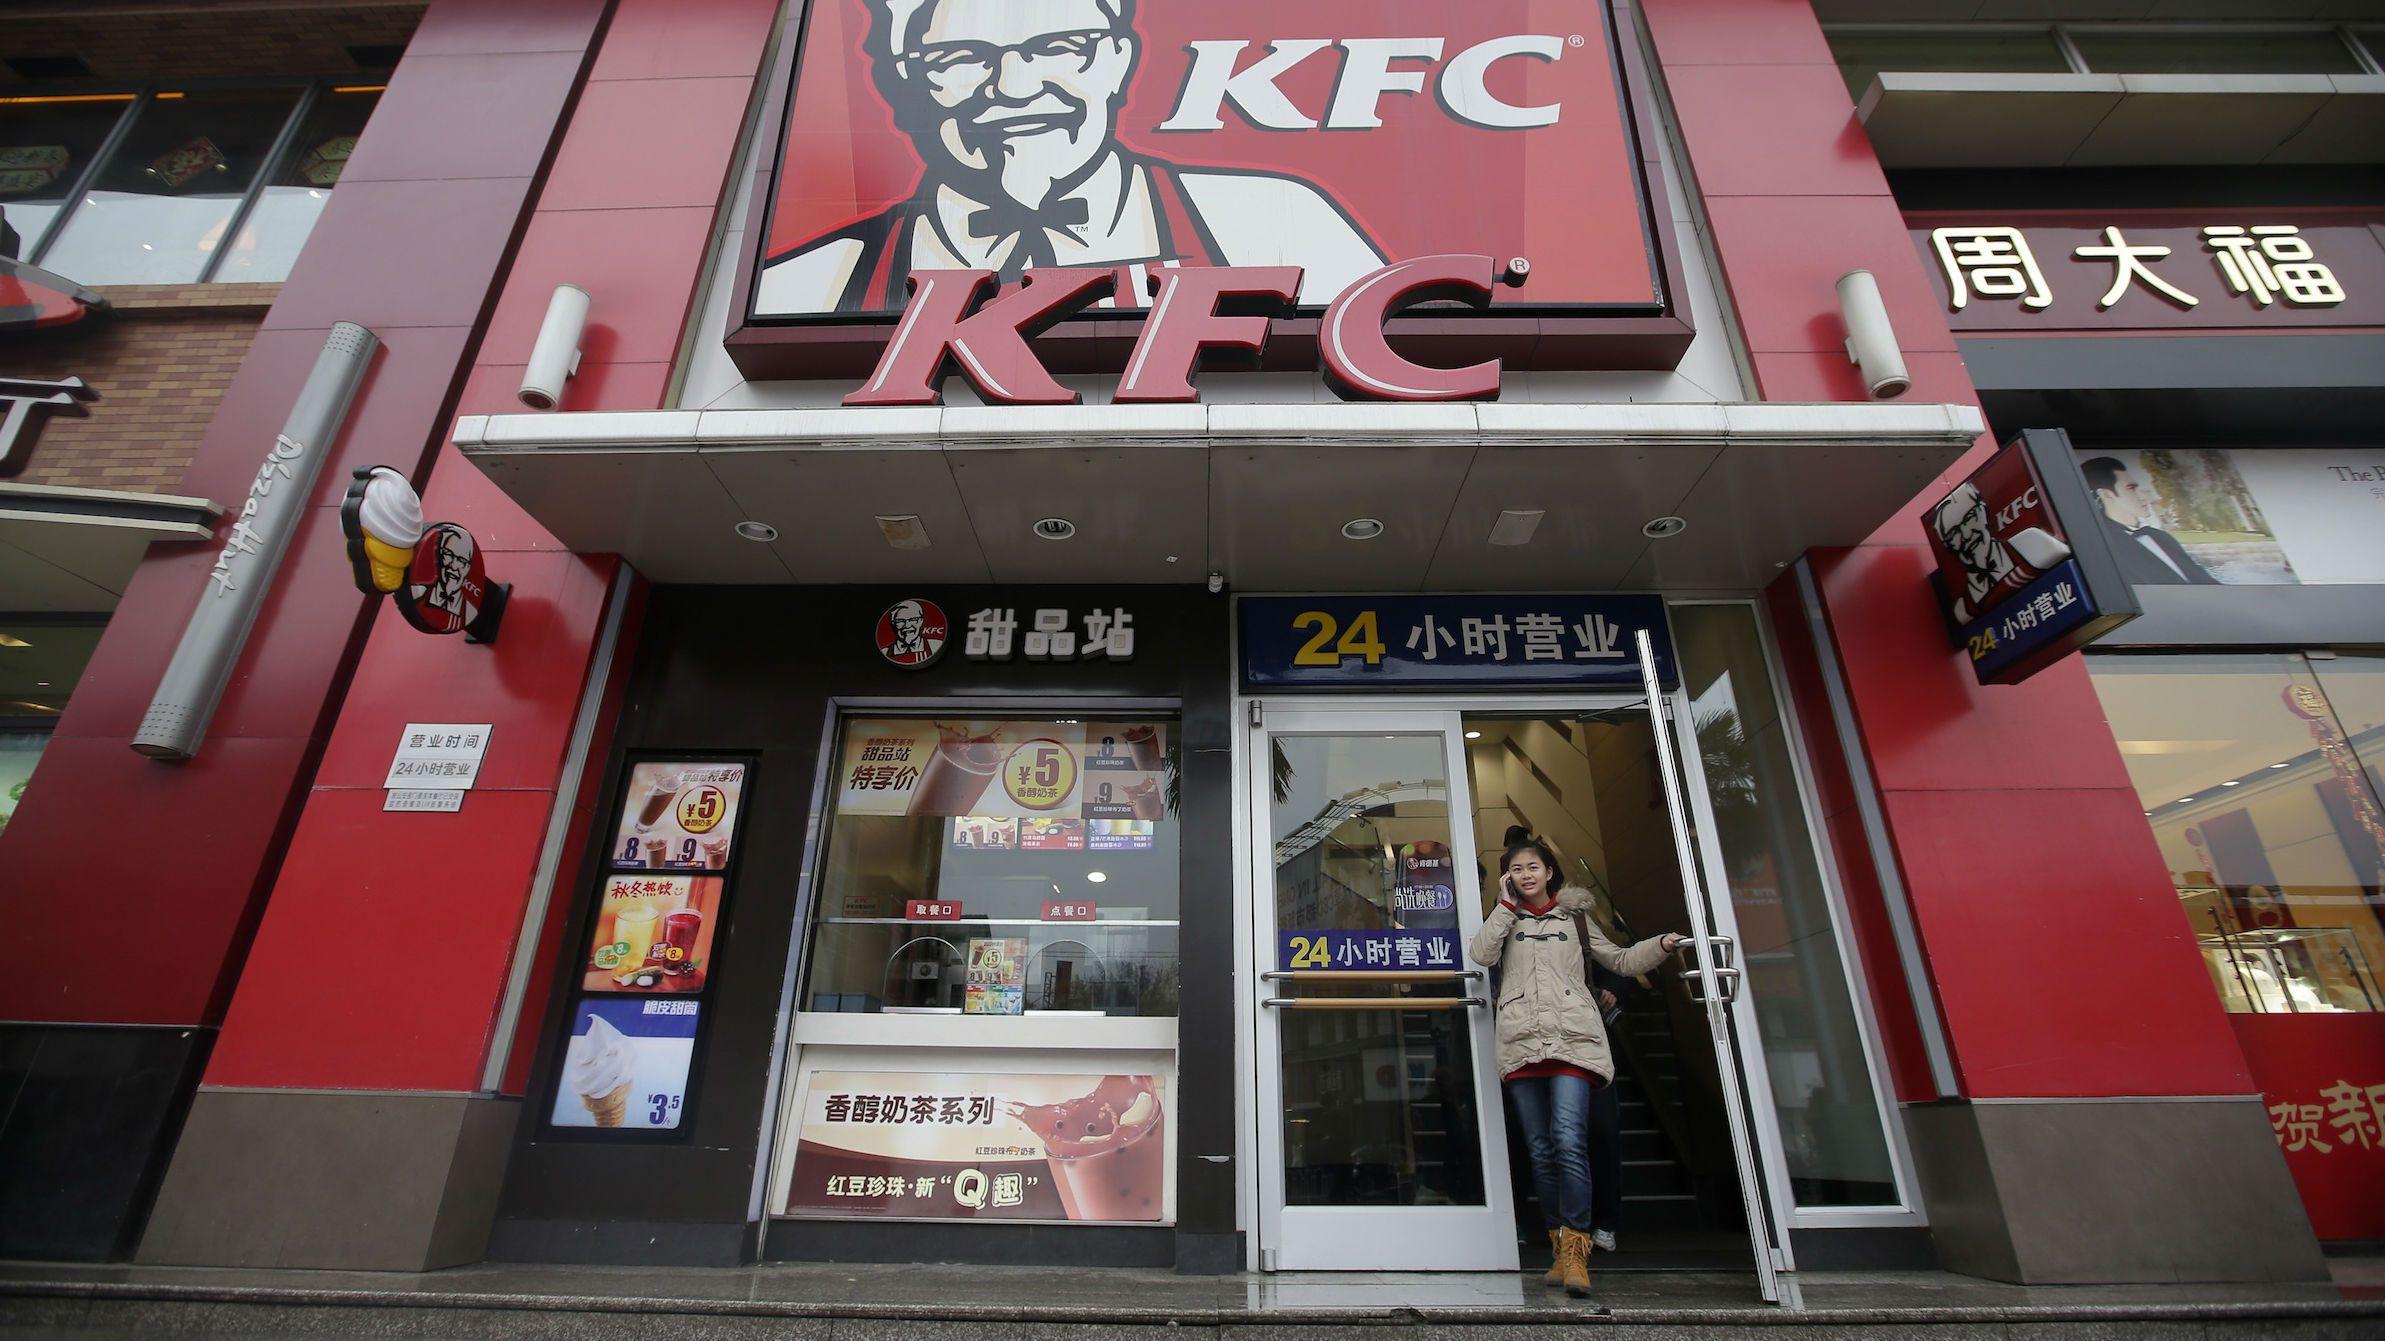 KFC china door web